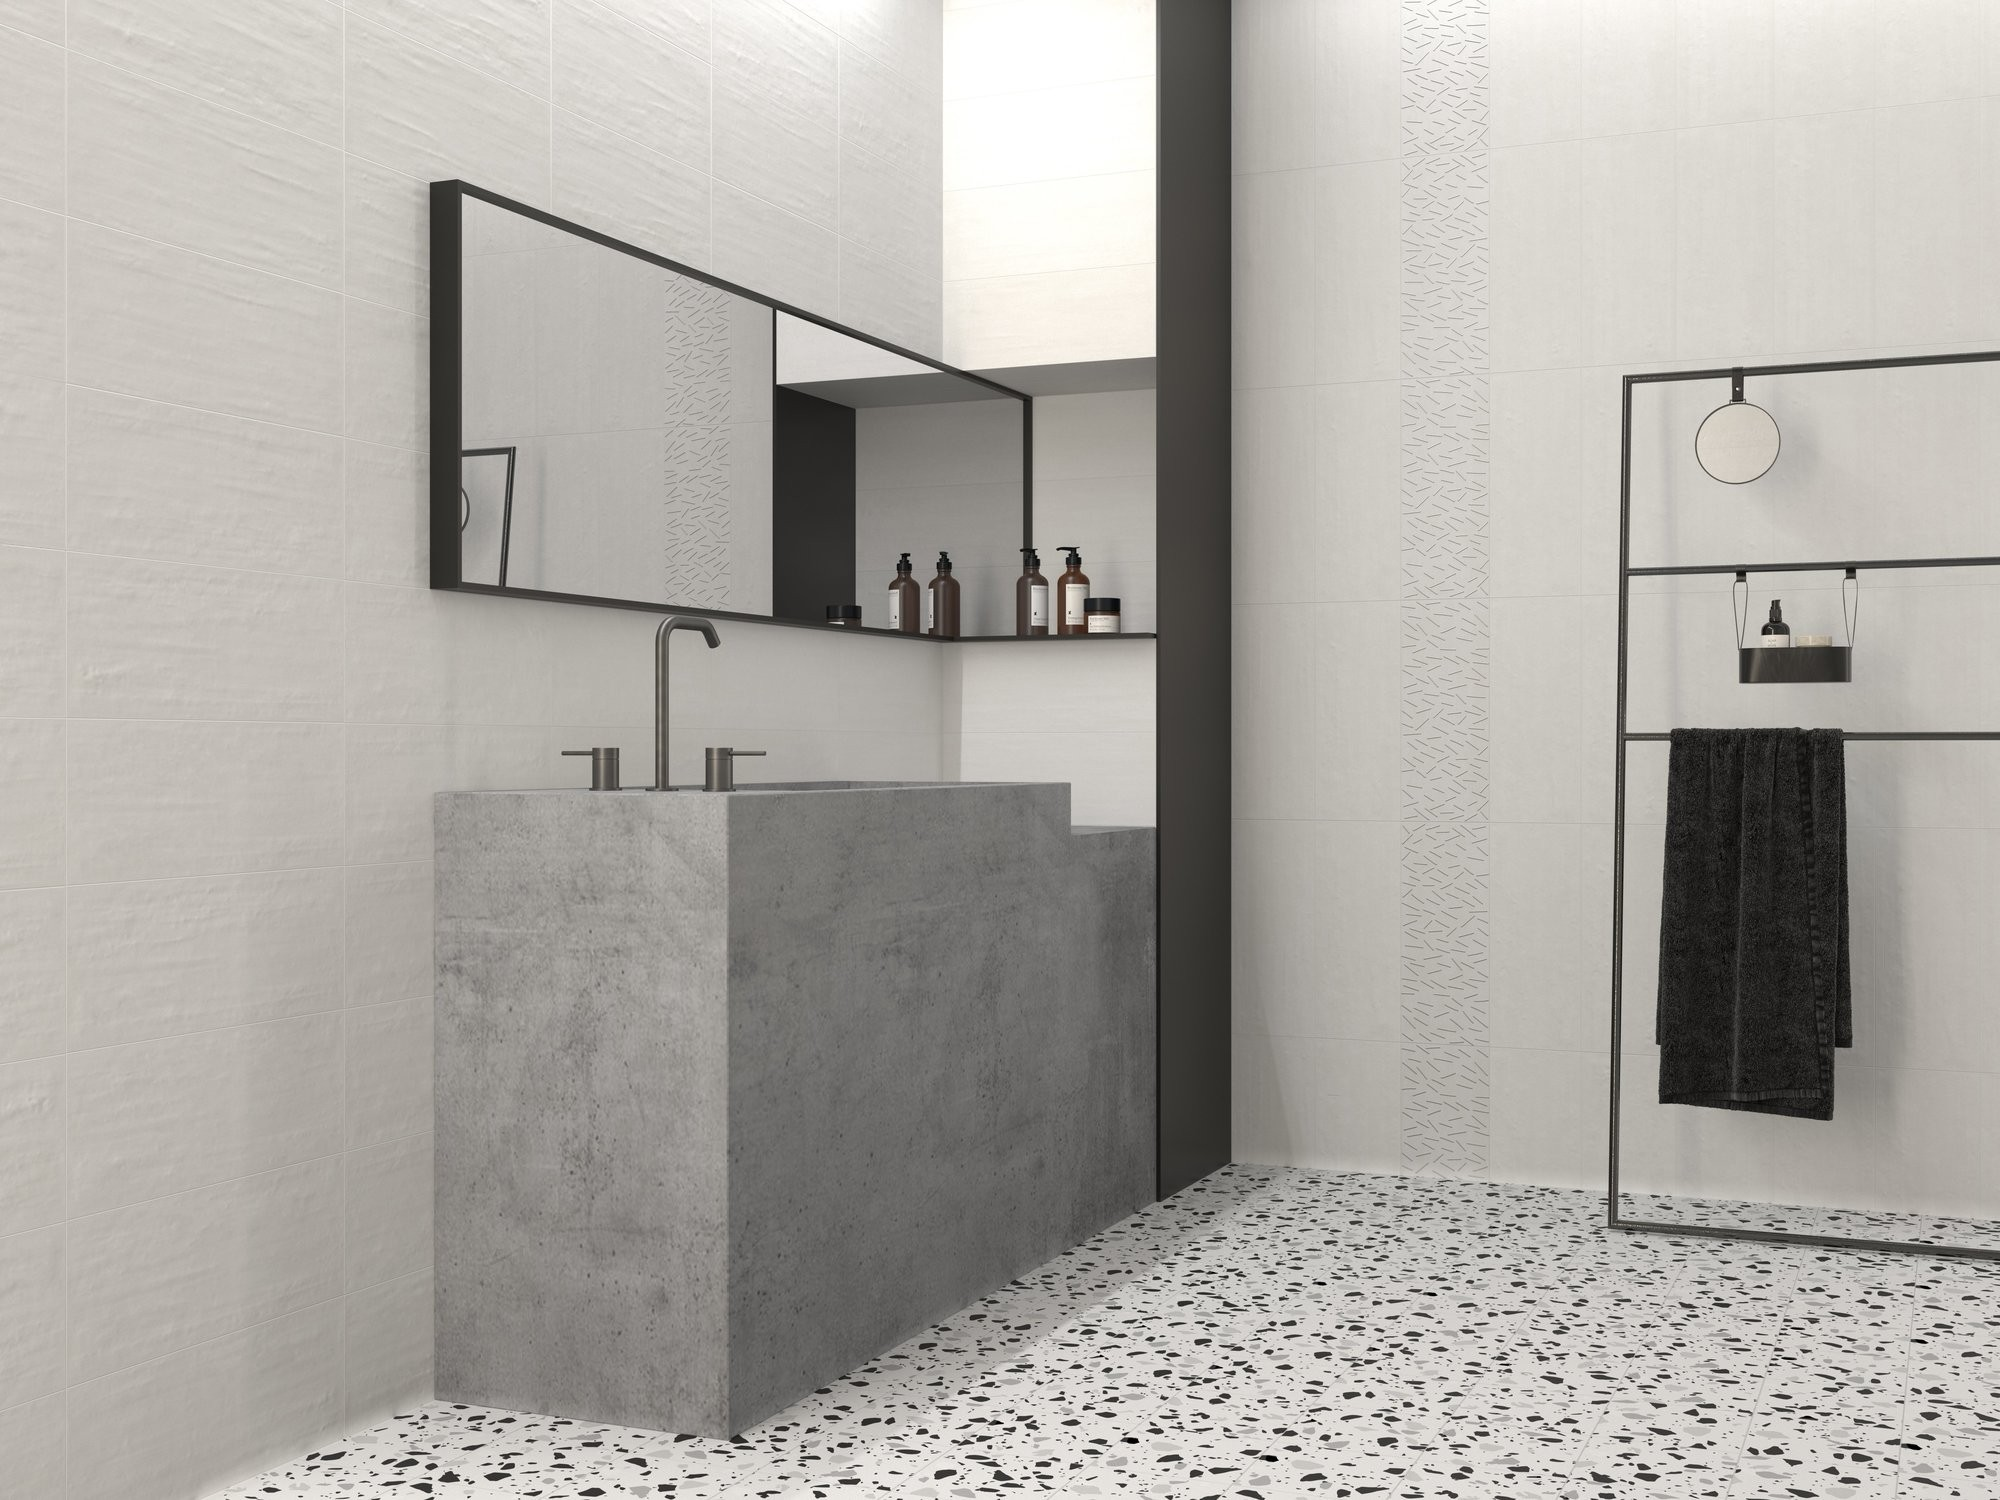 Carrelage interieur TERRAZZO TRENDY 20x20 - APE GRUPO